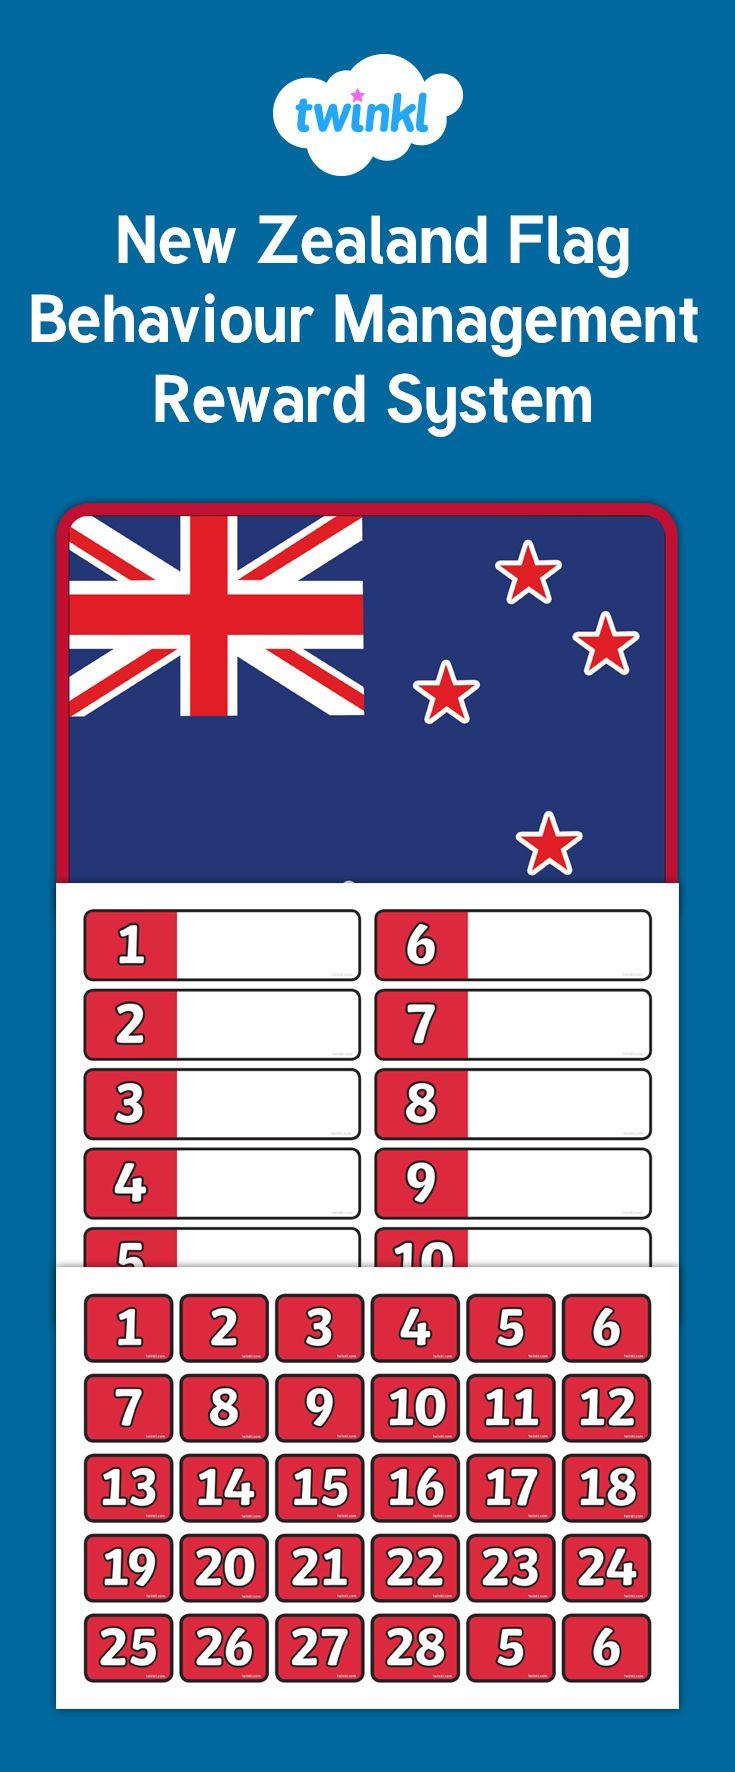 Behaviour Management using the New Zealand flag.